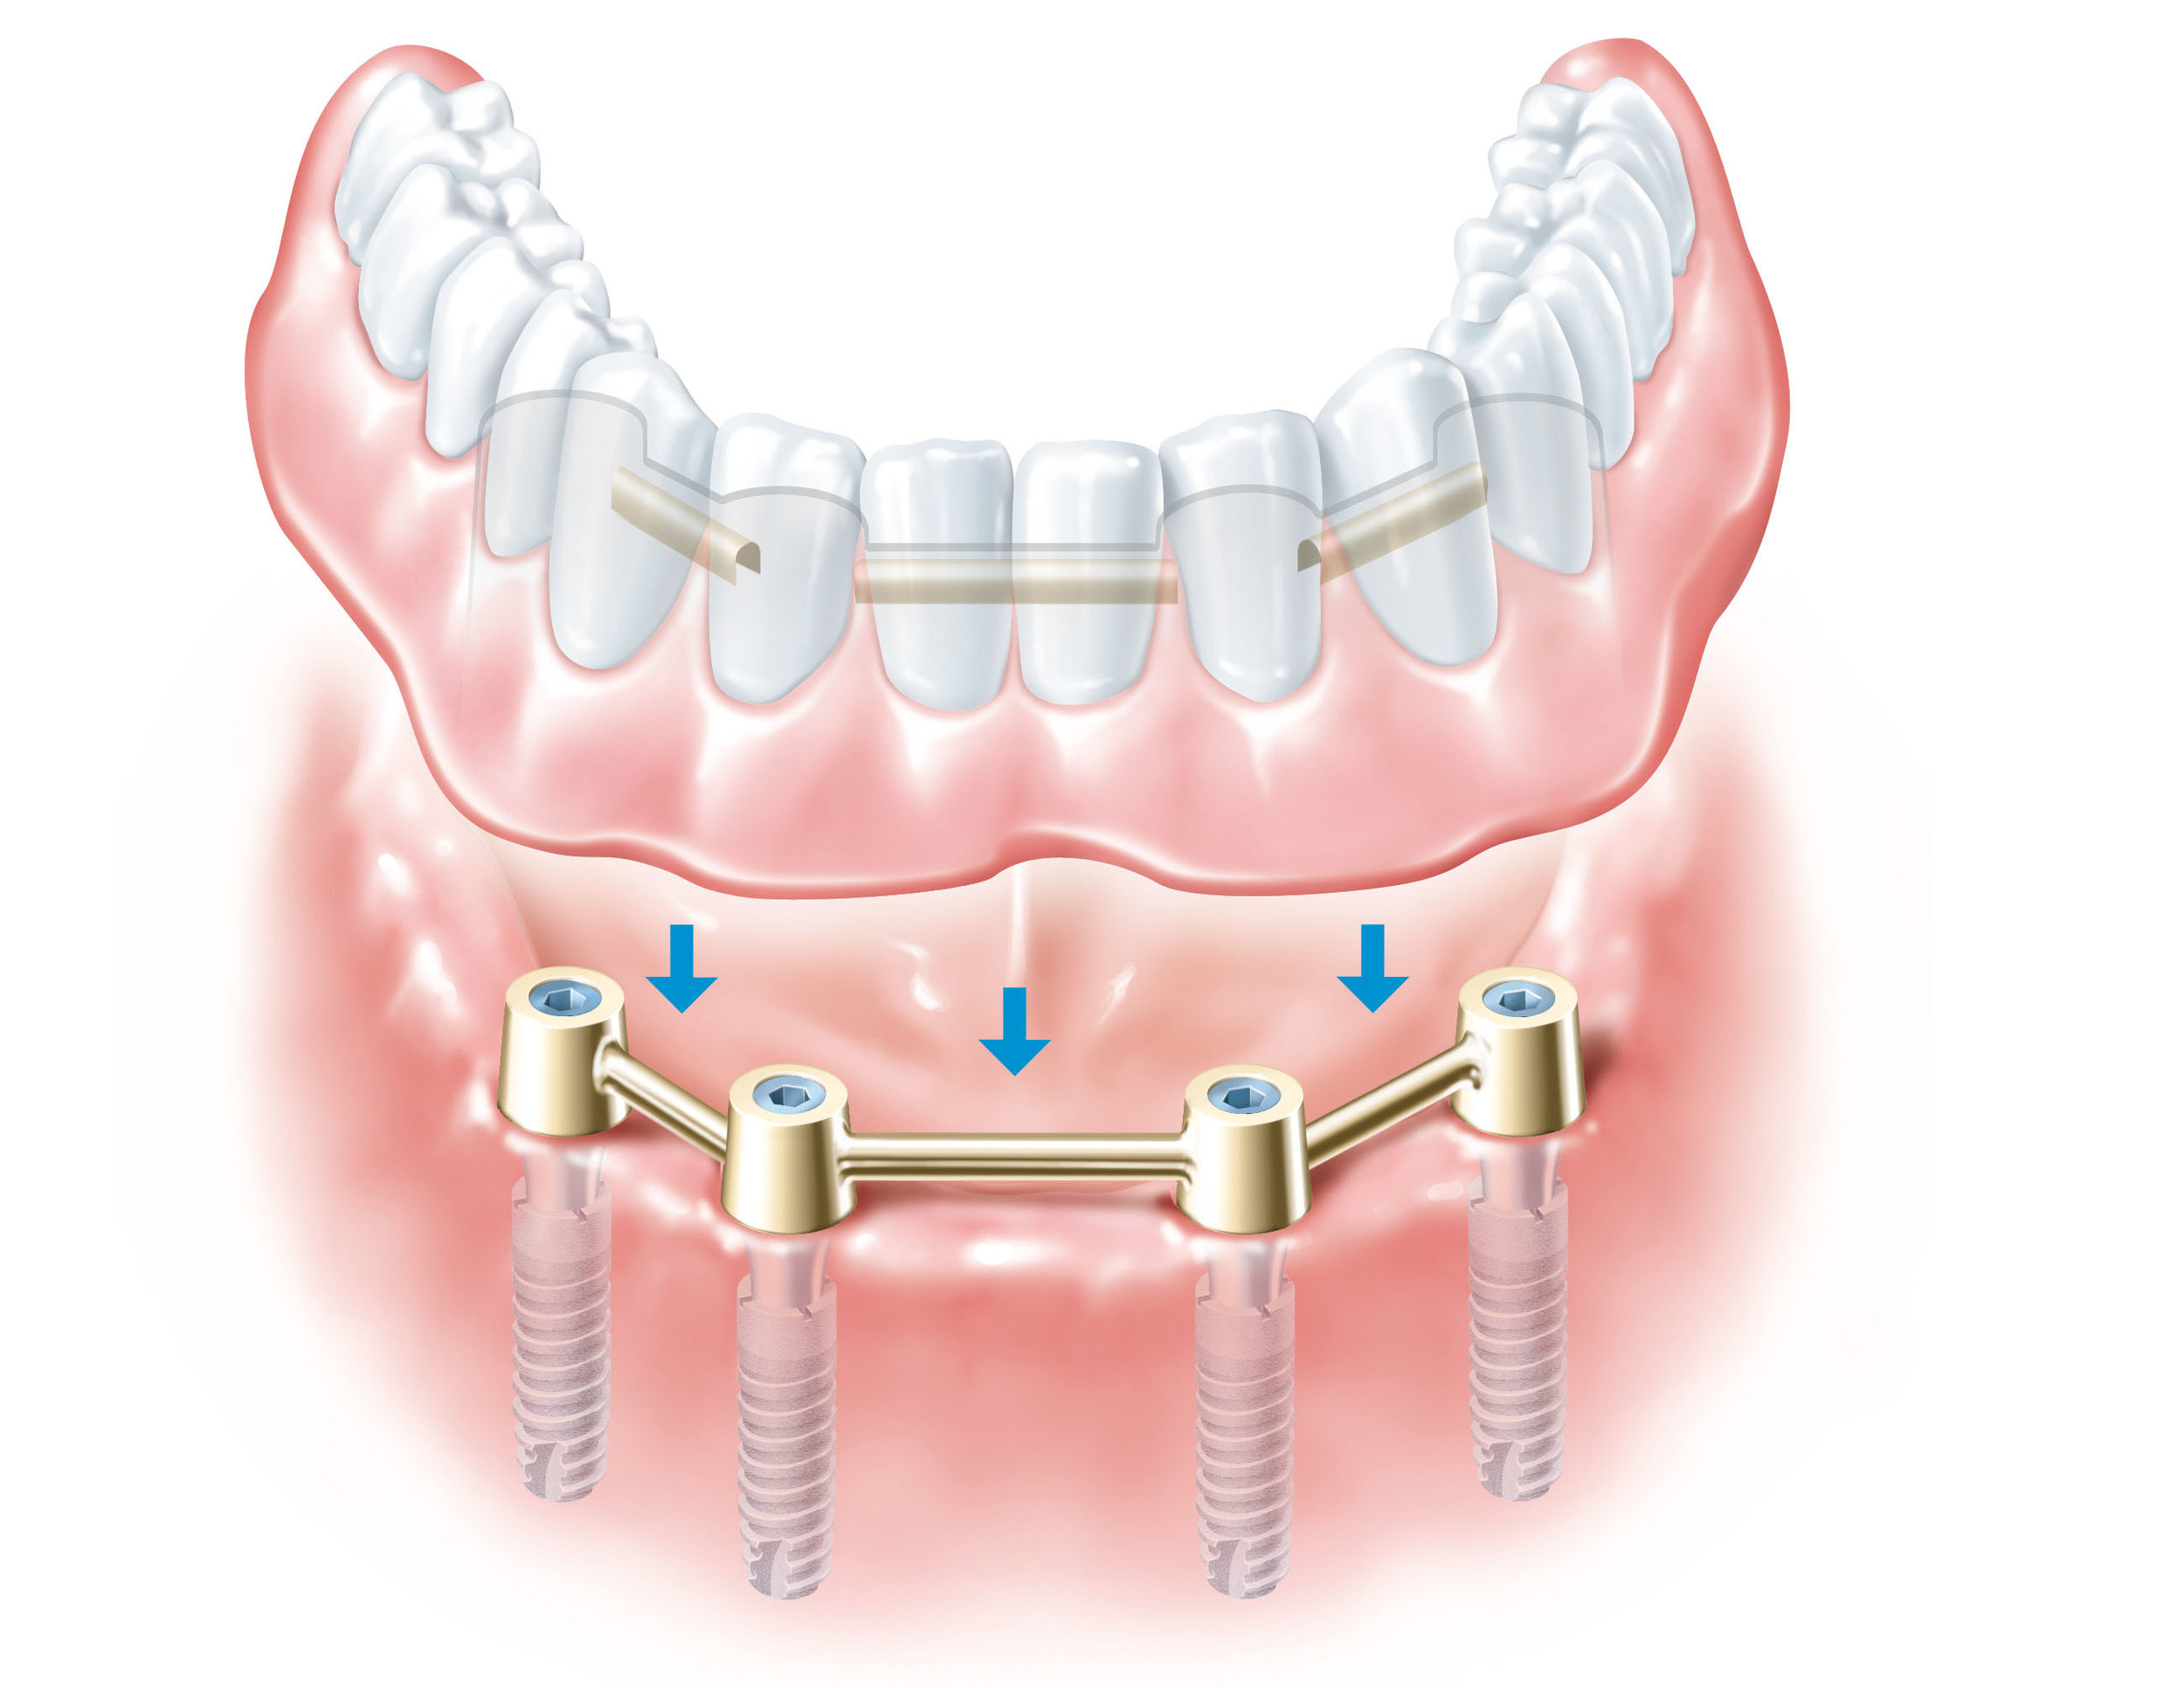 implant-secured-dentures.jpg